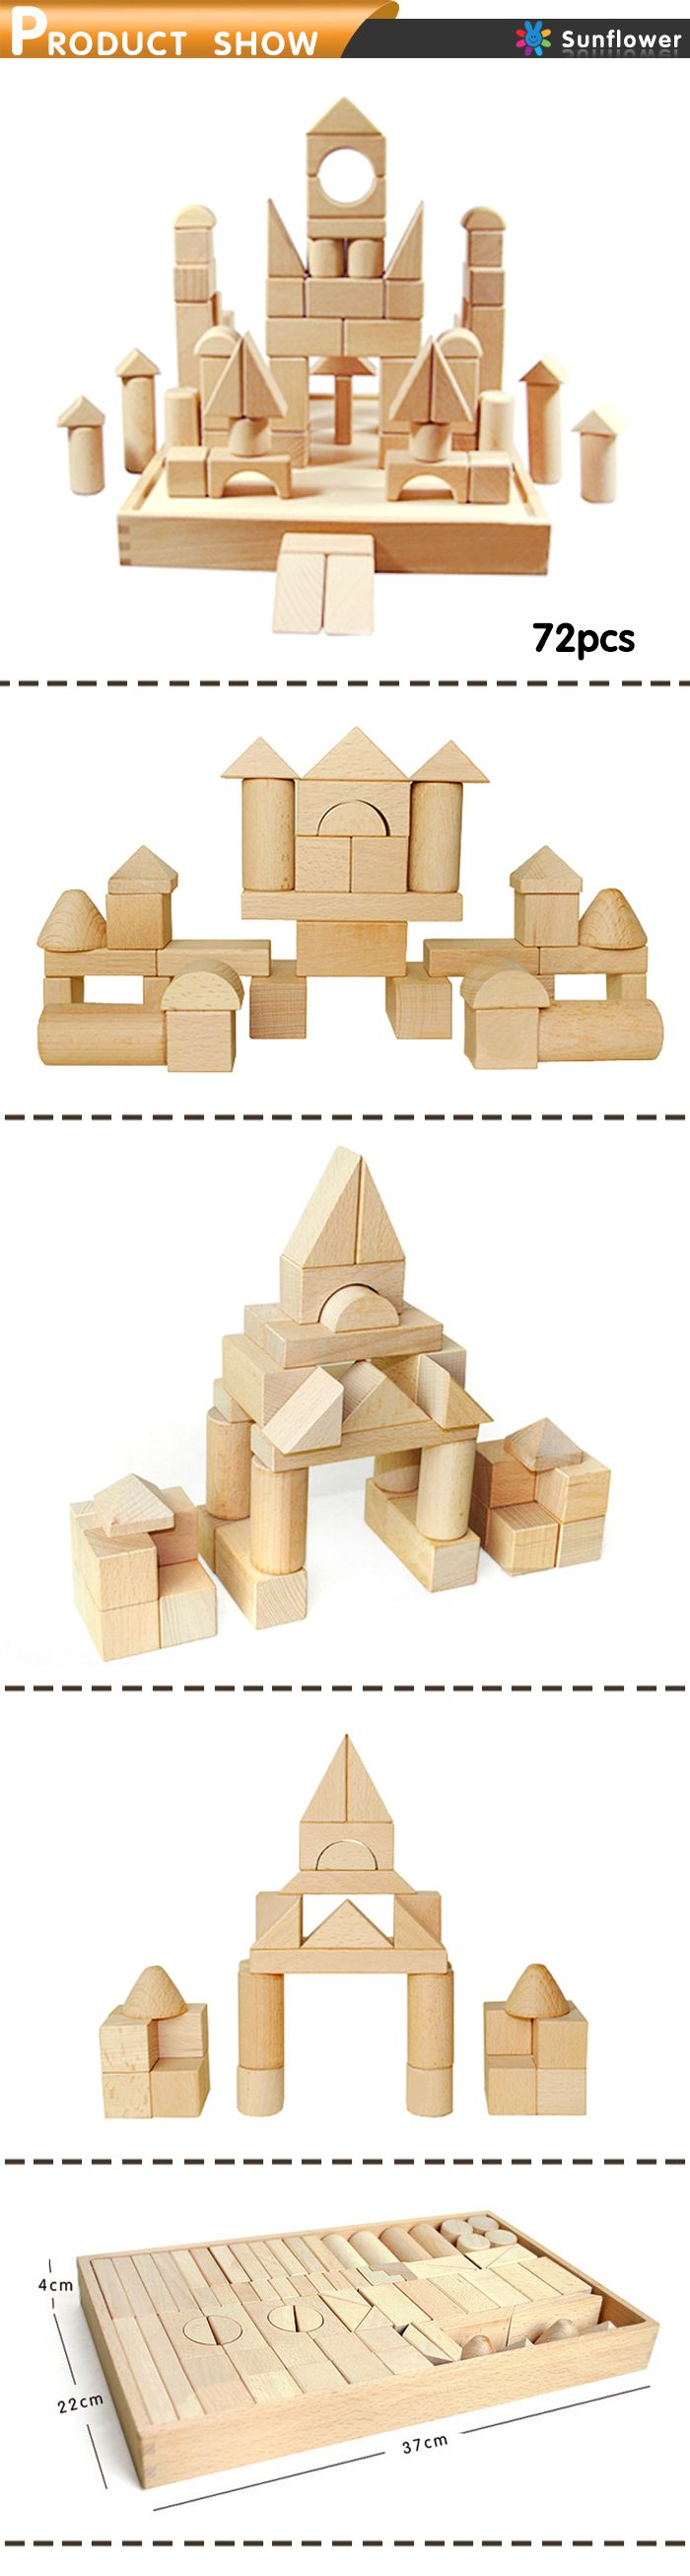 Wooden building blocks /Educational toys